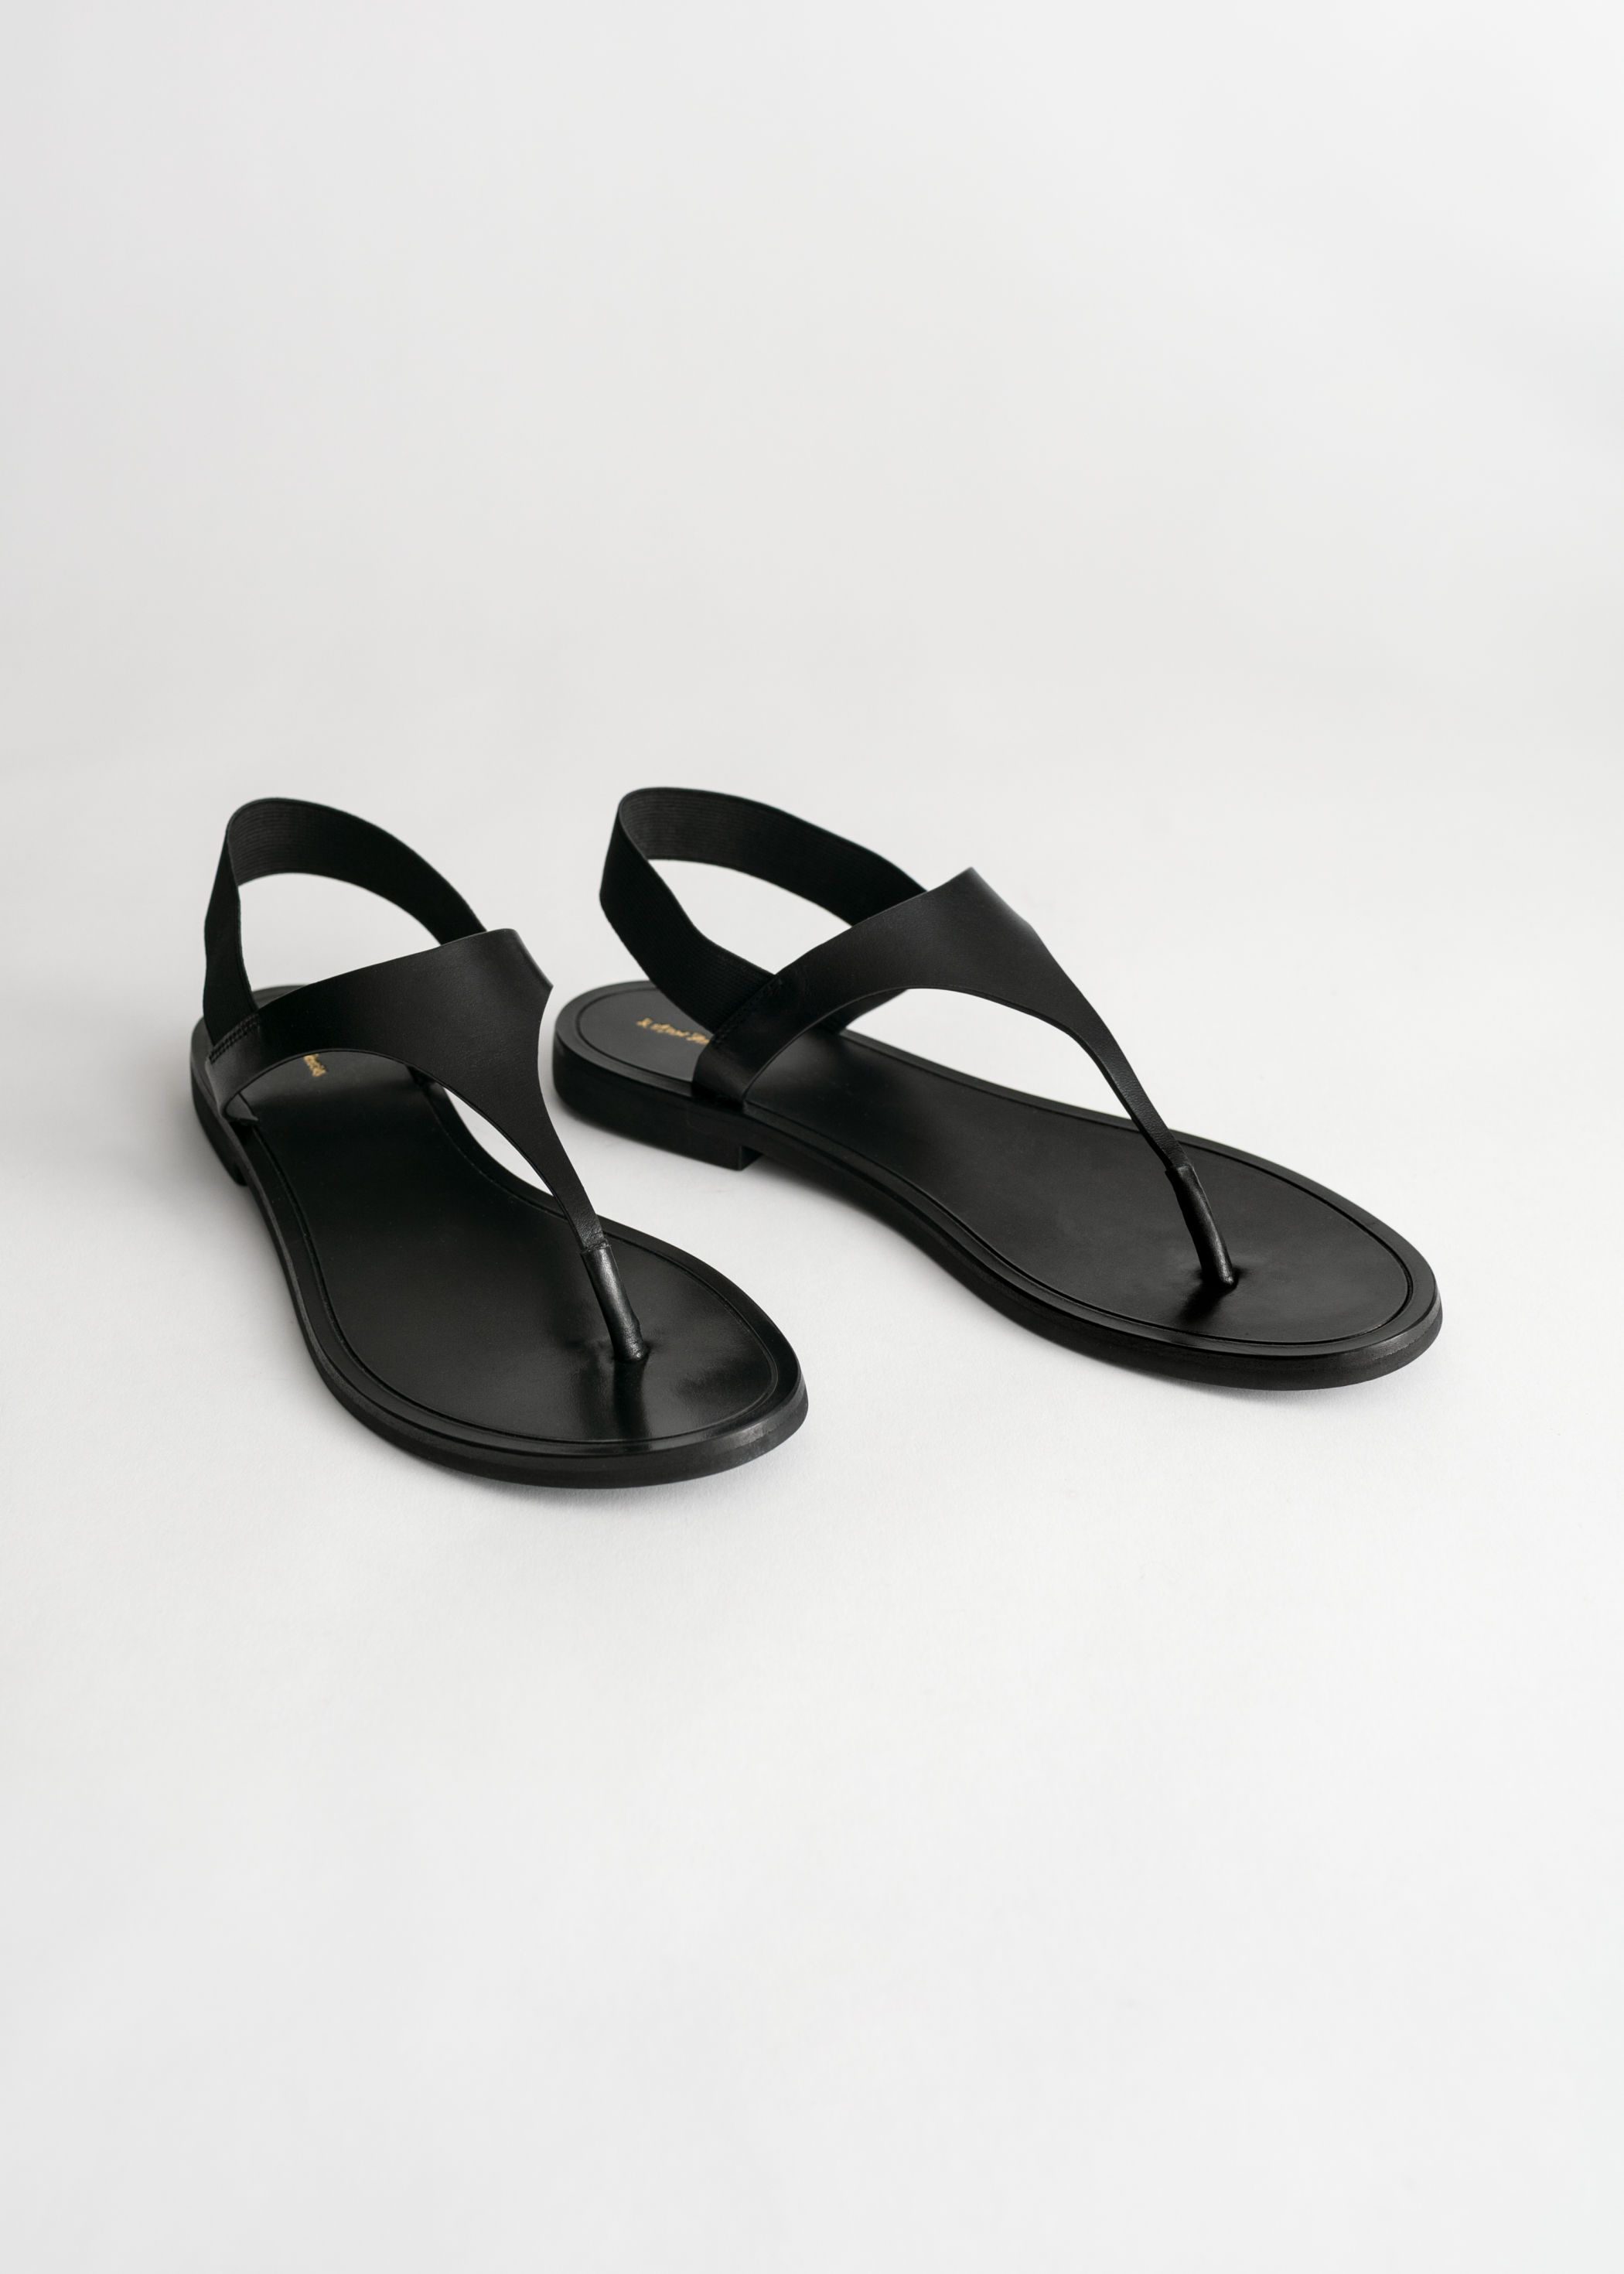 Black sandals flat, T strap sandals